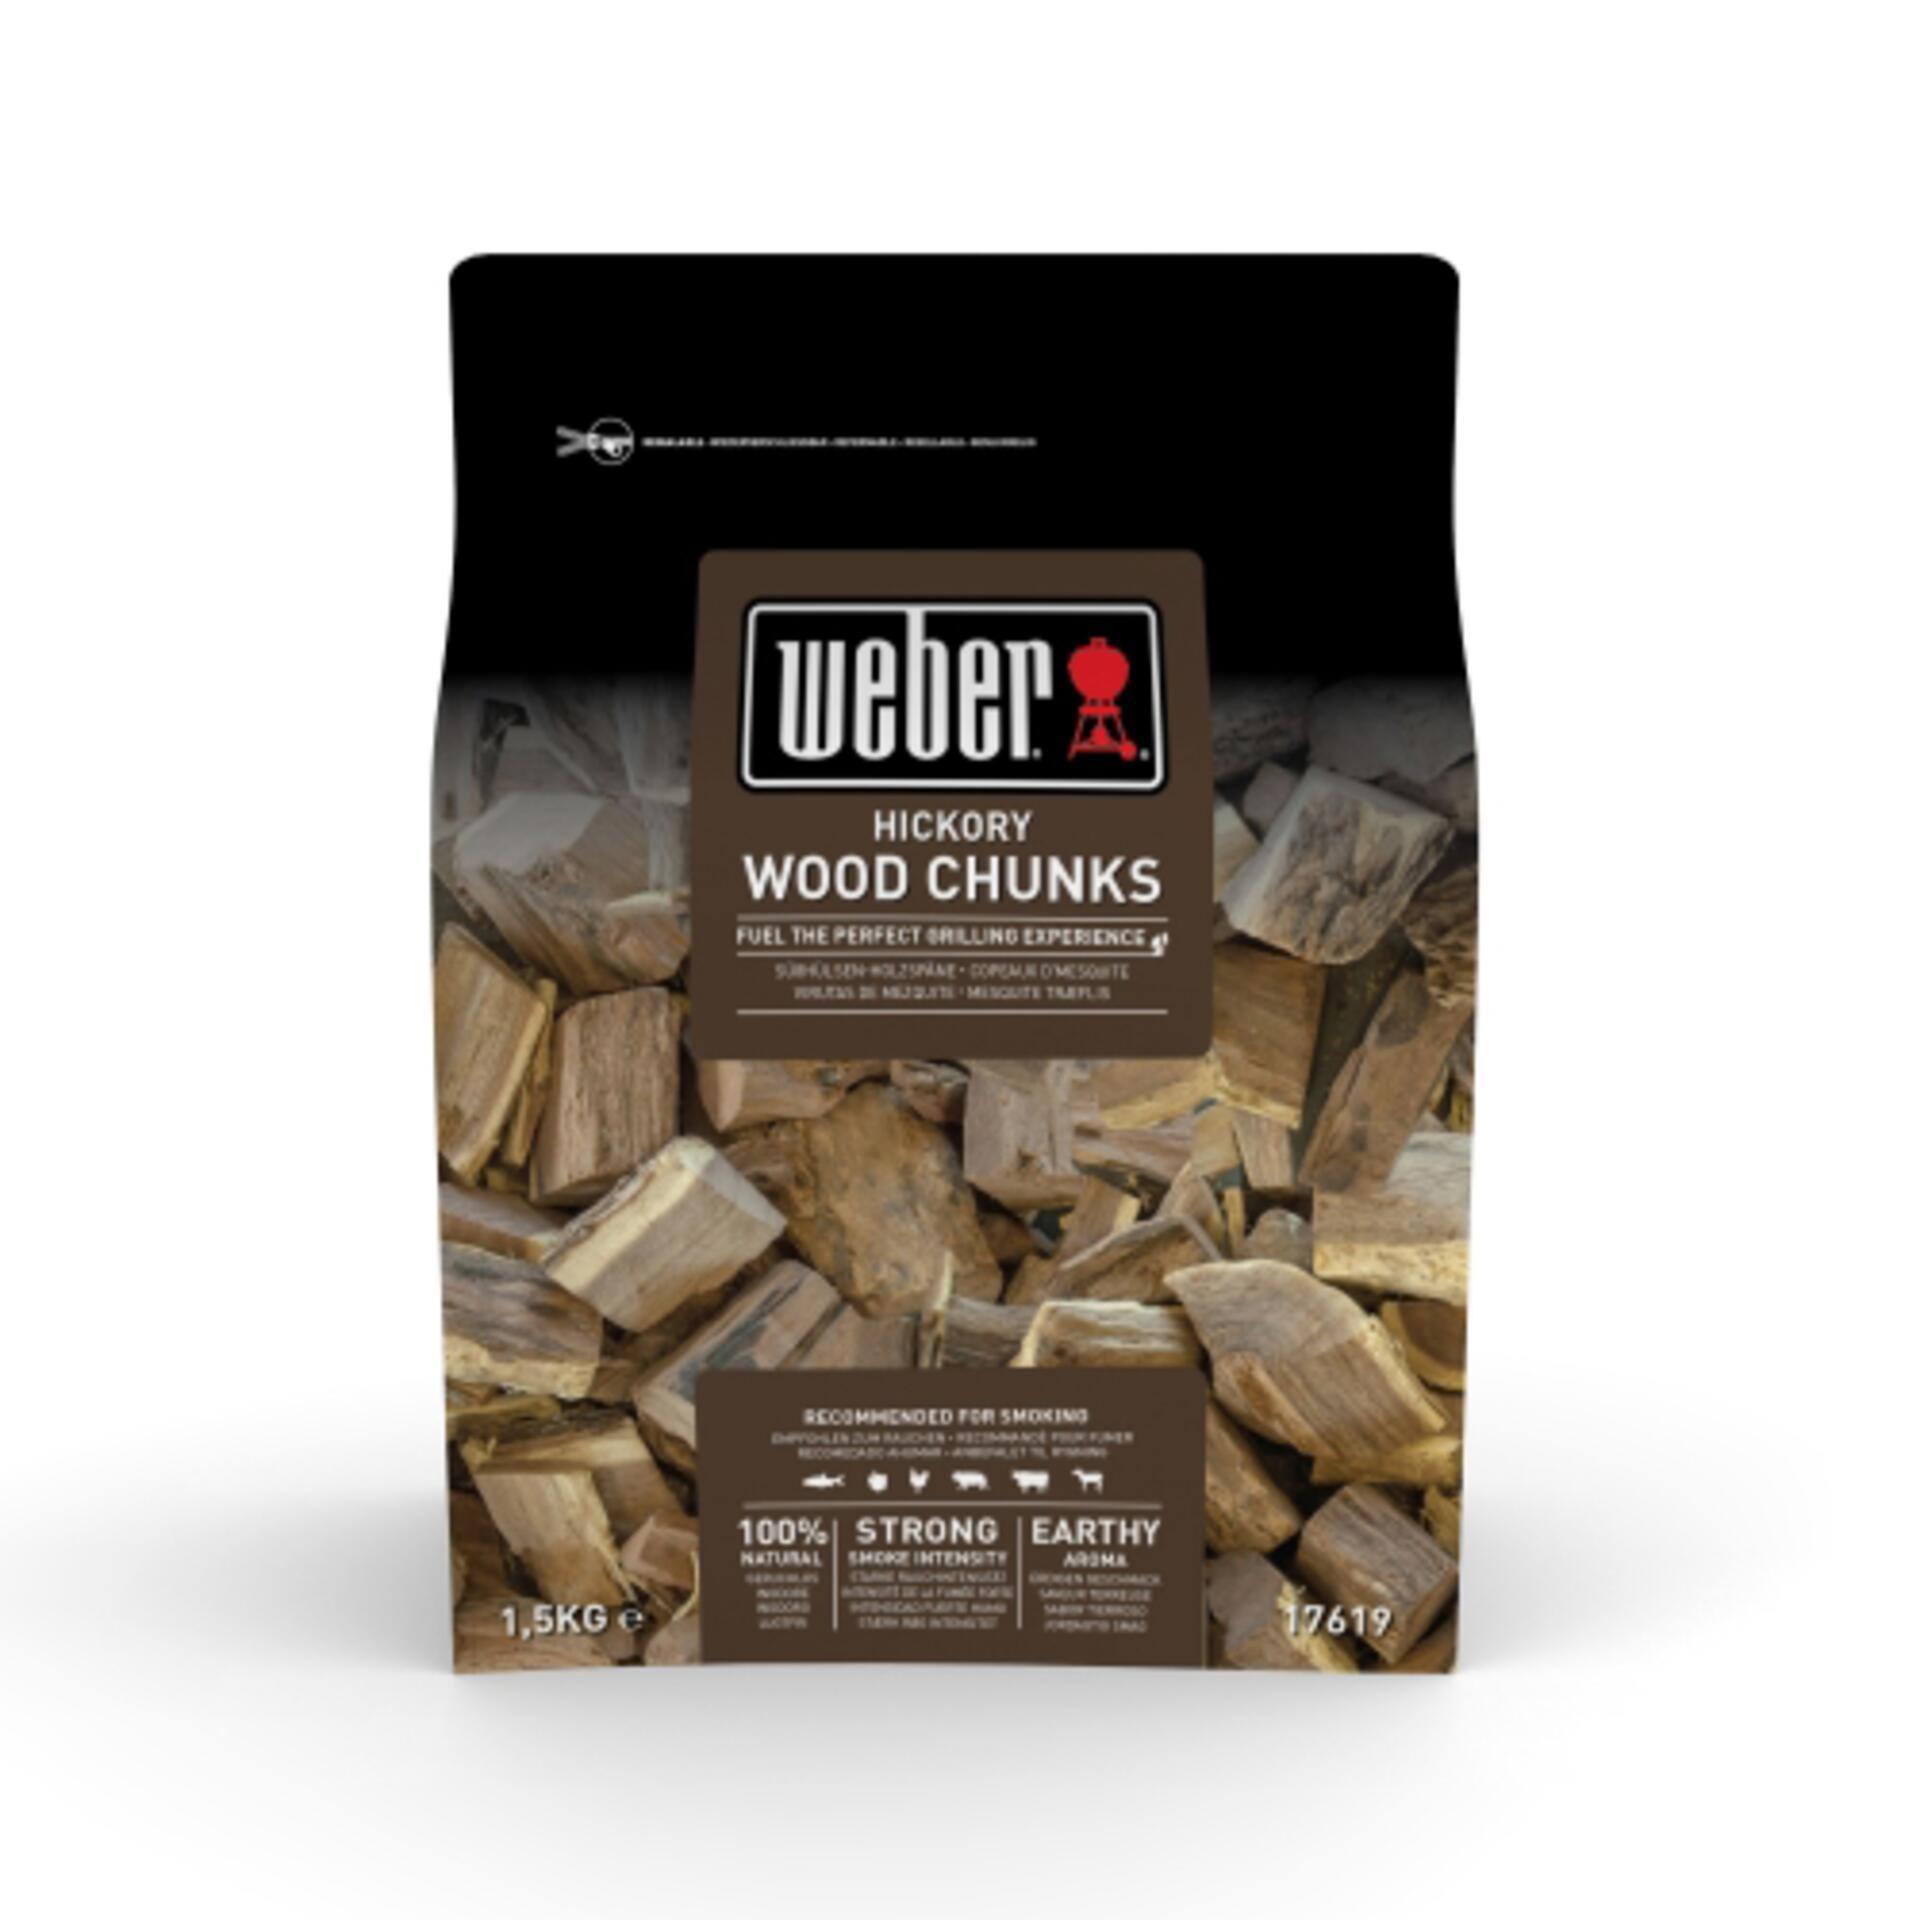 Weber Wood Chunks Hickory 17619